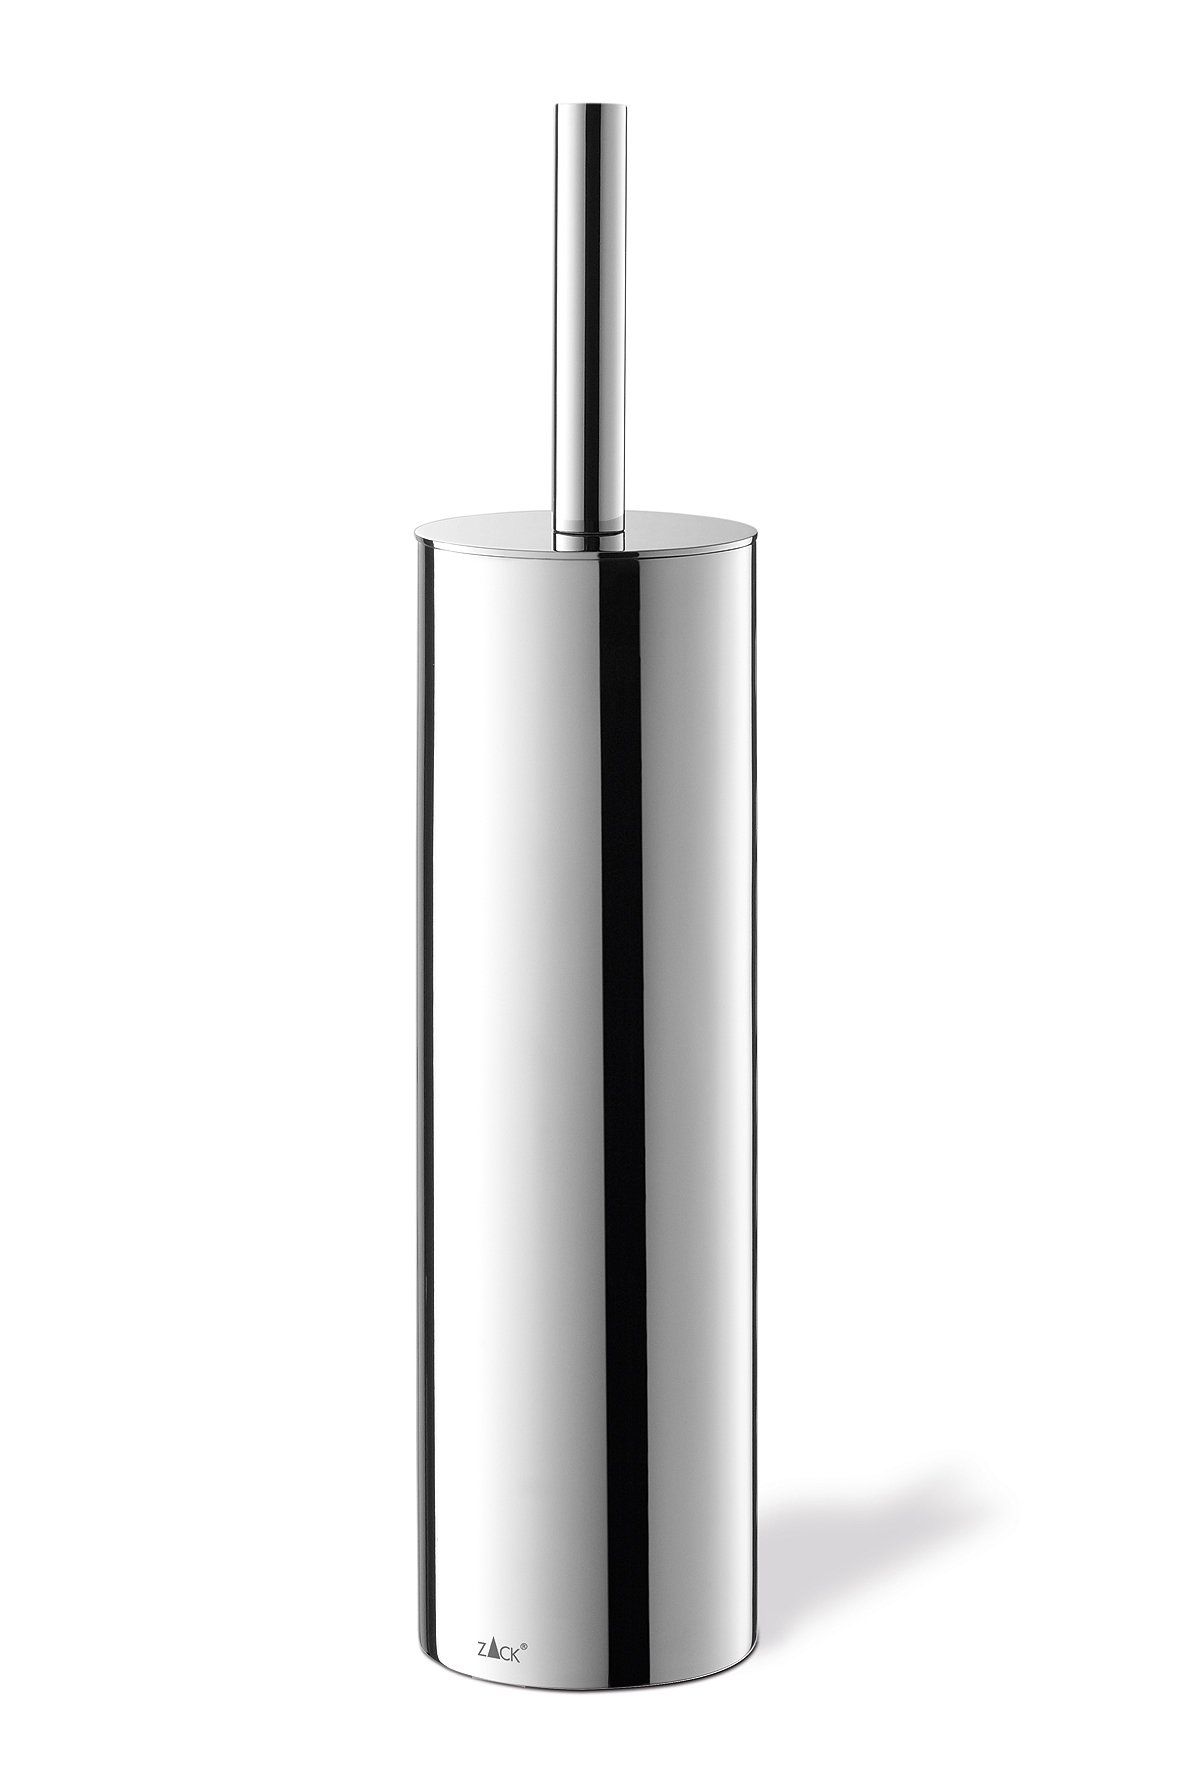 Zack 40069 Tubo Toilet Brush Set, Mirror Polished Finish, 15.94 by 3.54-Inch